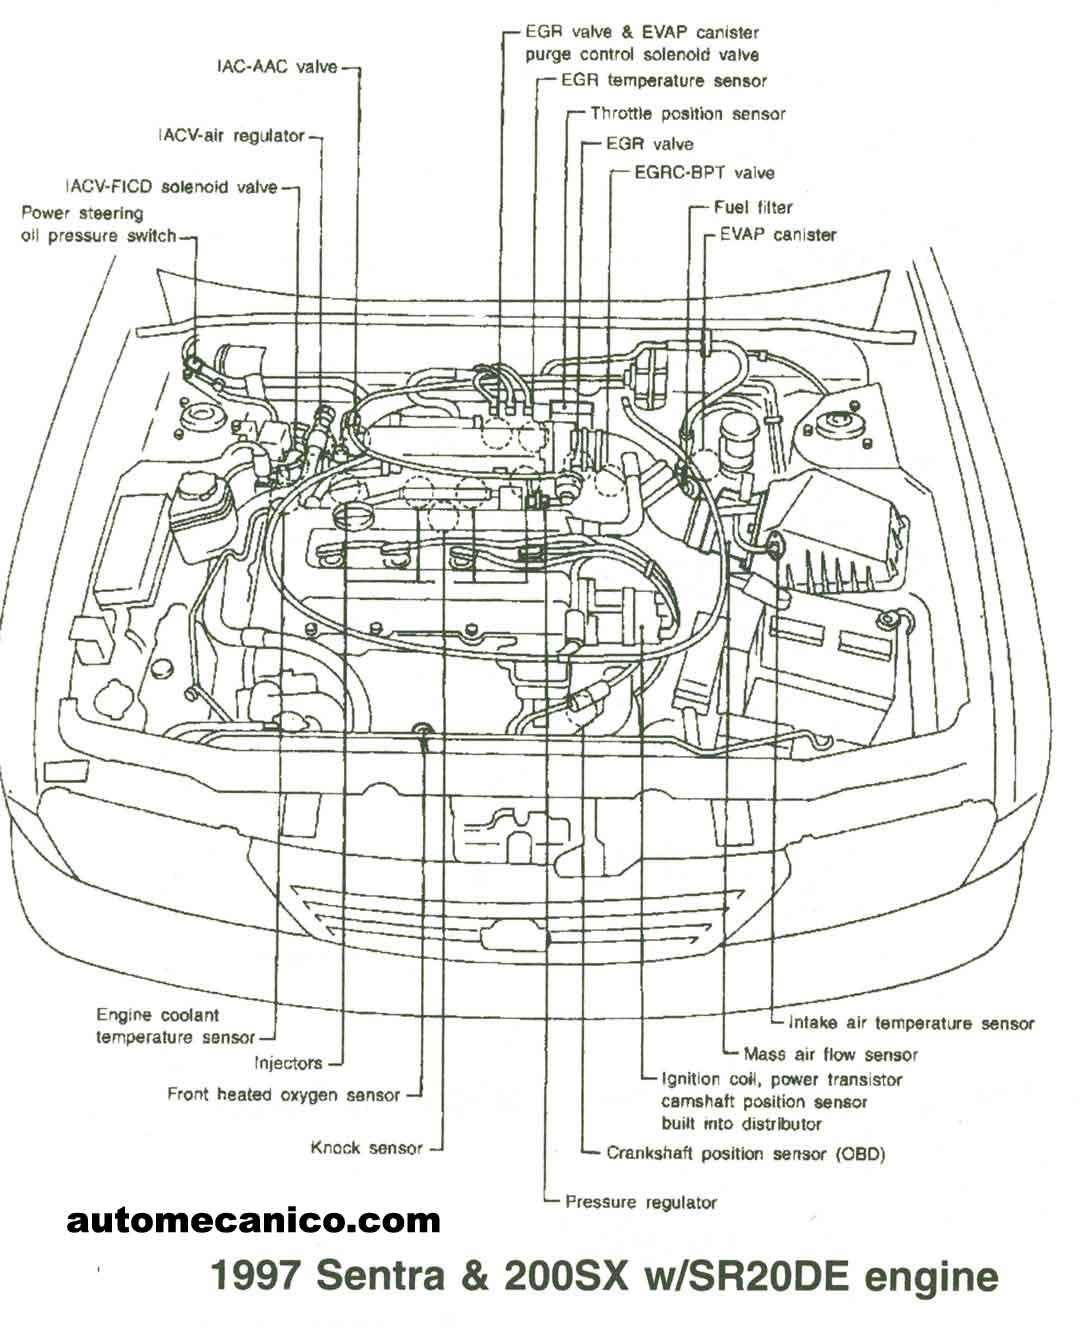 Nissan Ubicacion De Sensores Y Componentes Light